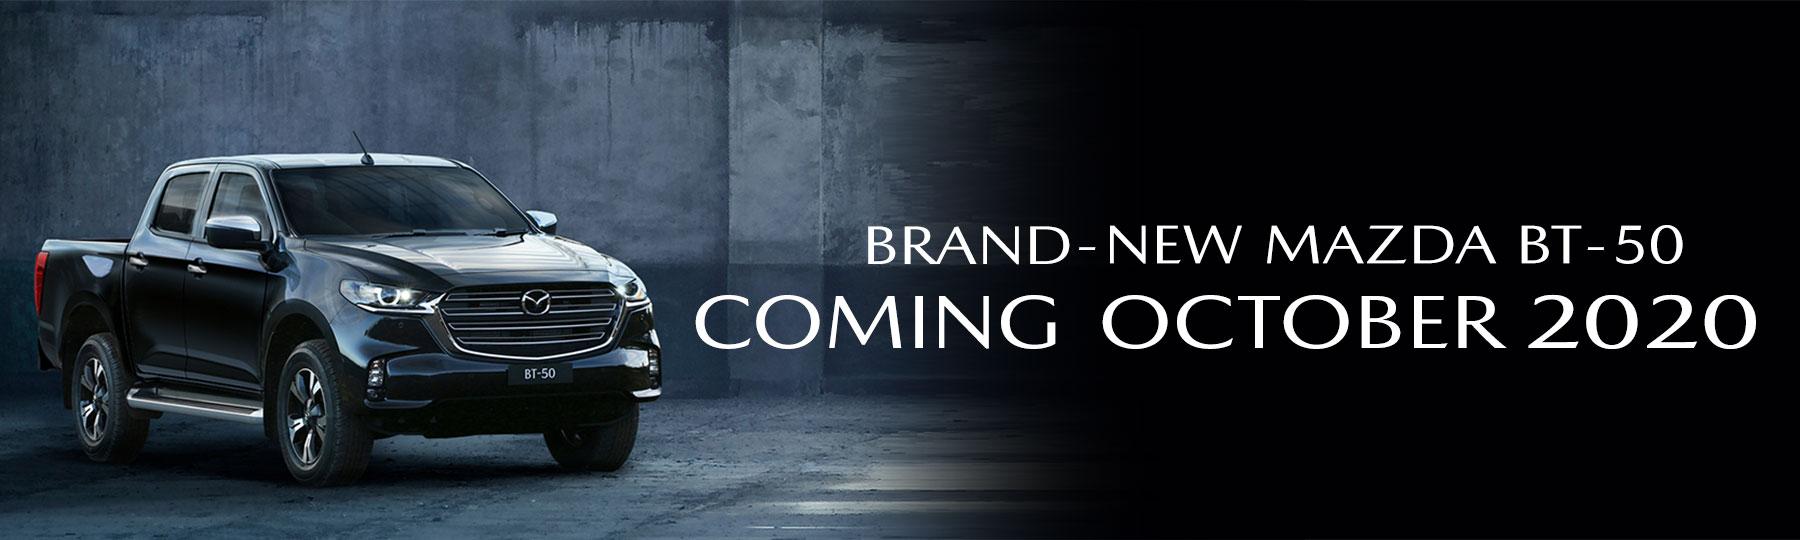 Brand-New Mazda BT-50 2020